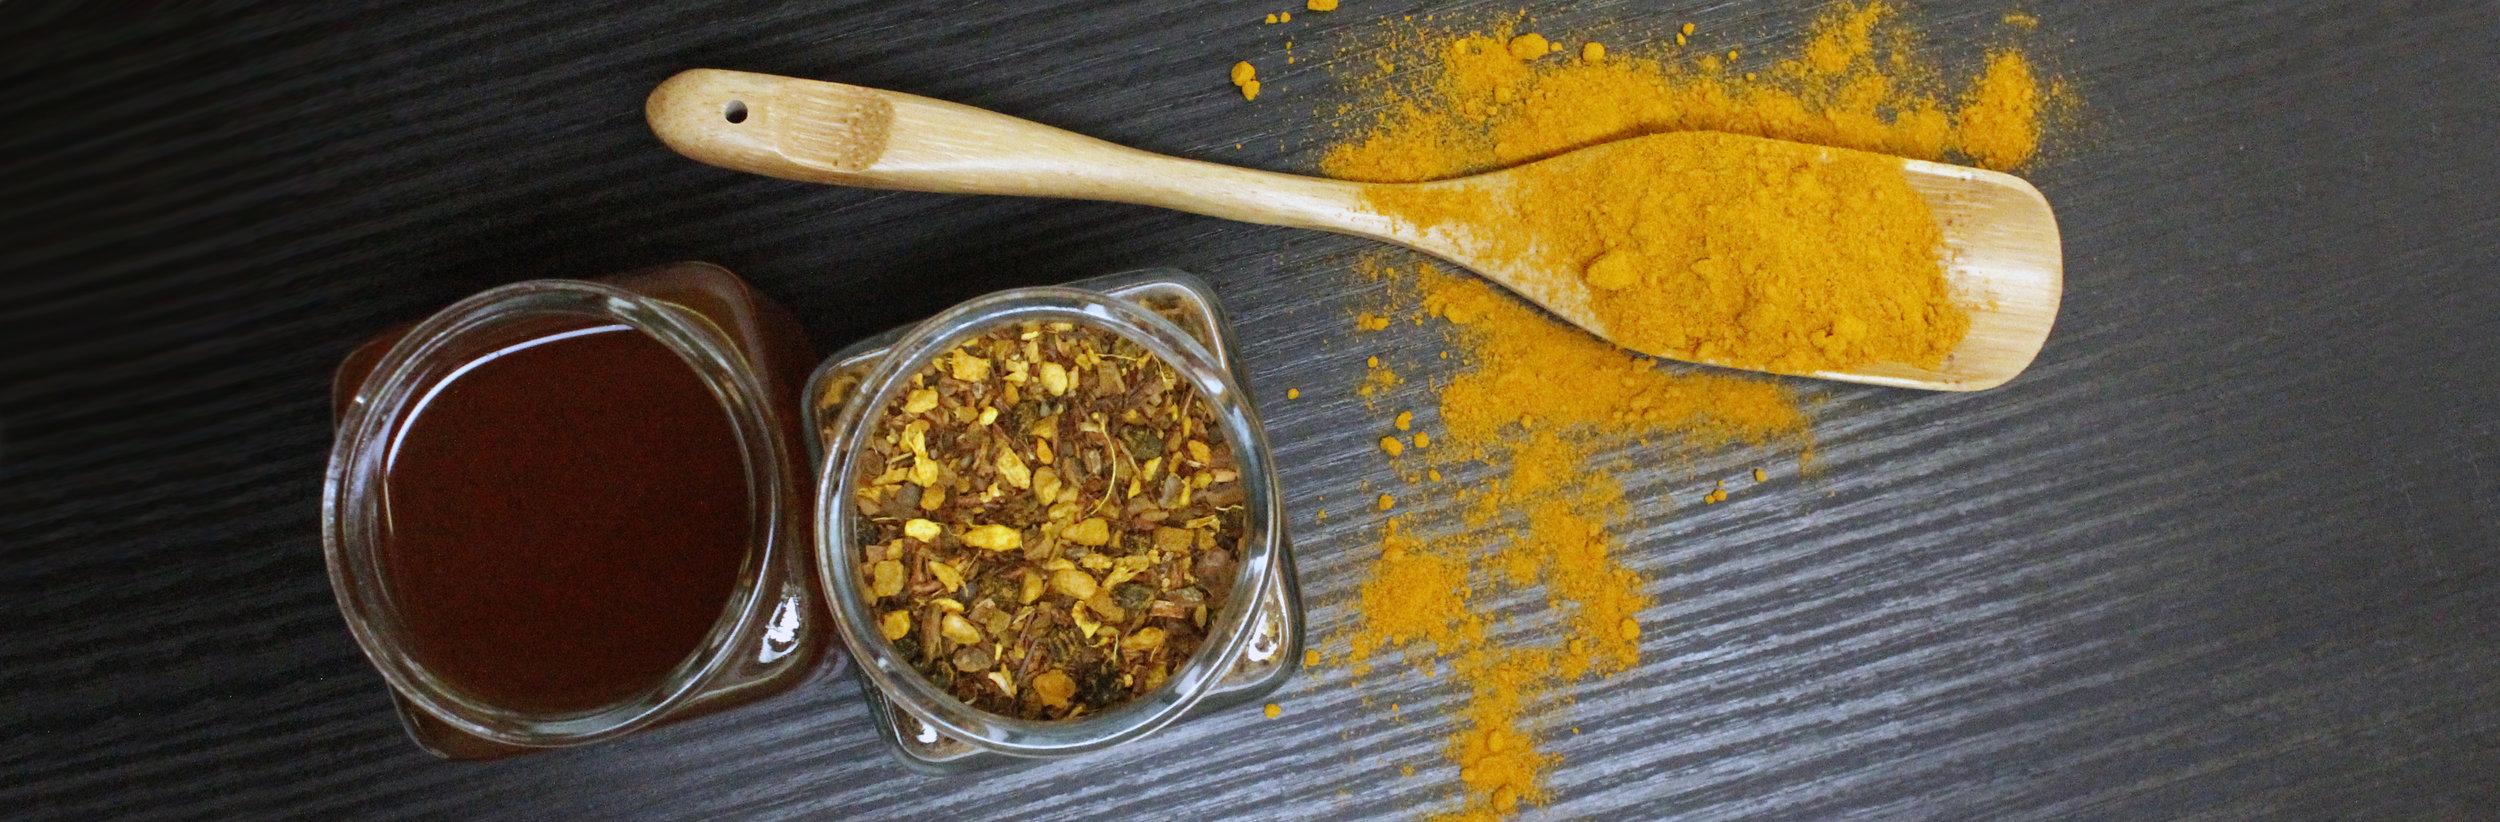 Herbal - Spicy Turmeric Tonic - Image.jpg